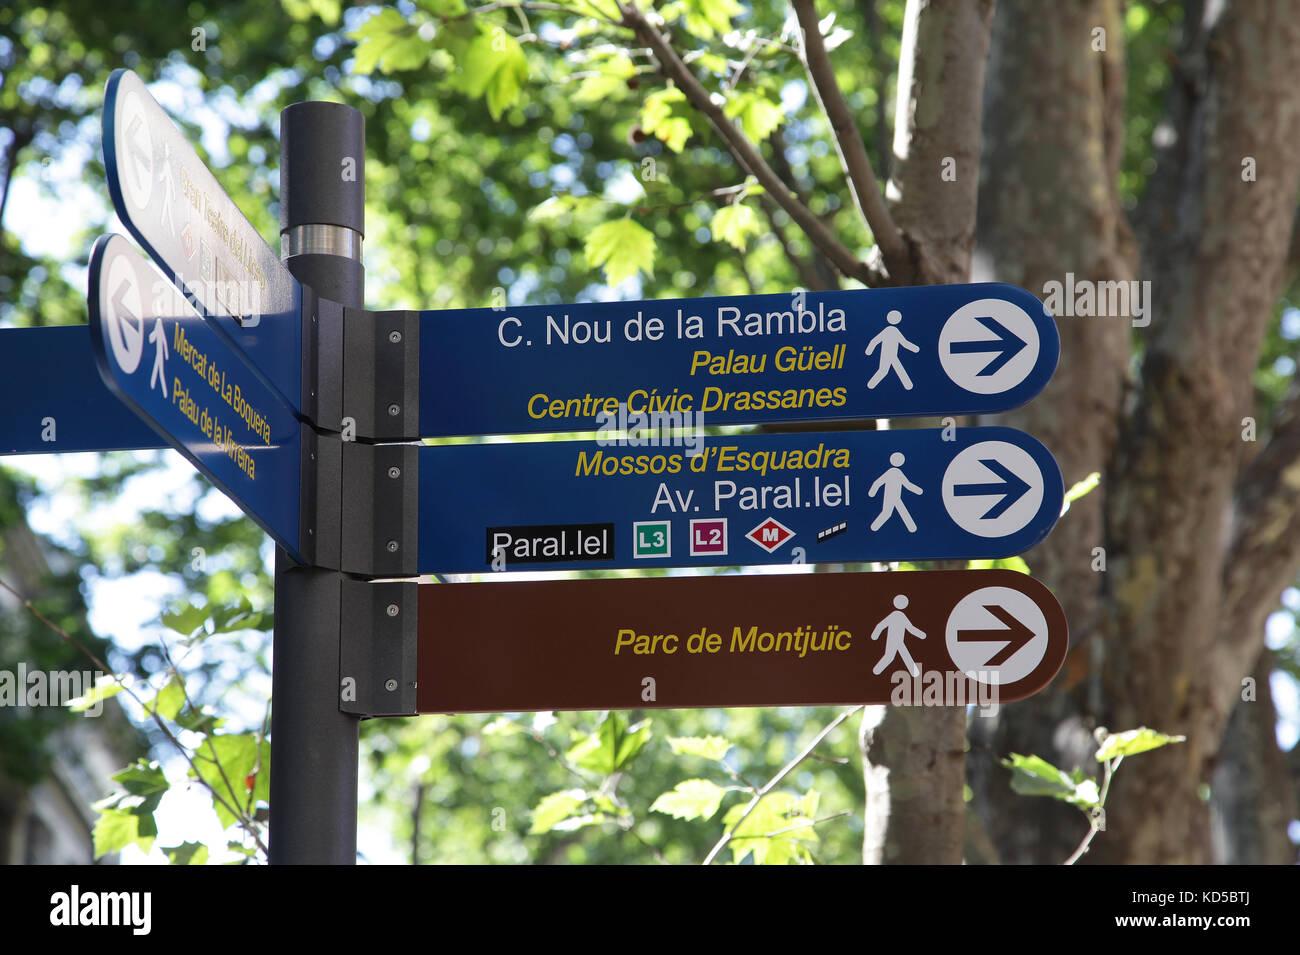 Street sign on the rambla in Barcelona Catalunya Spain - Stock Image